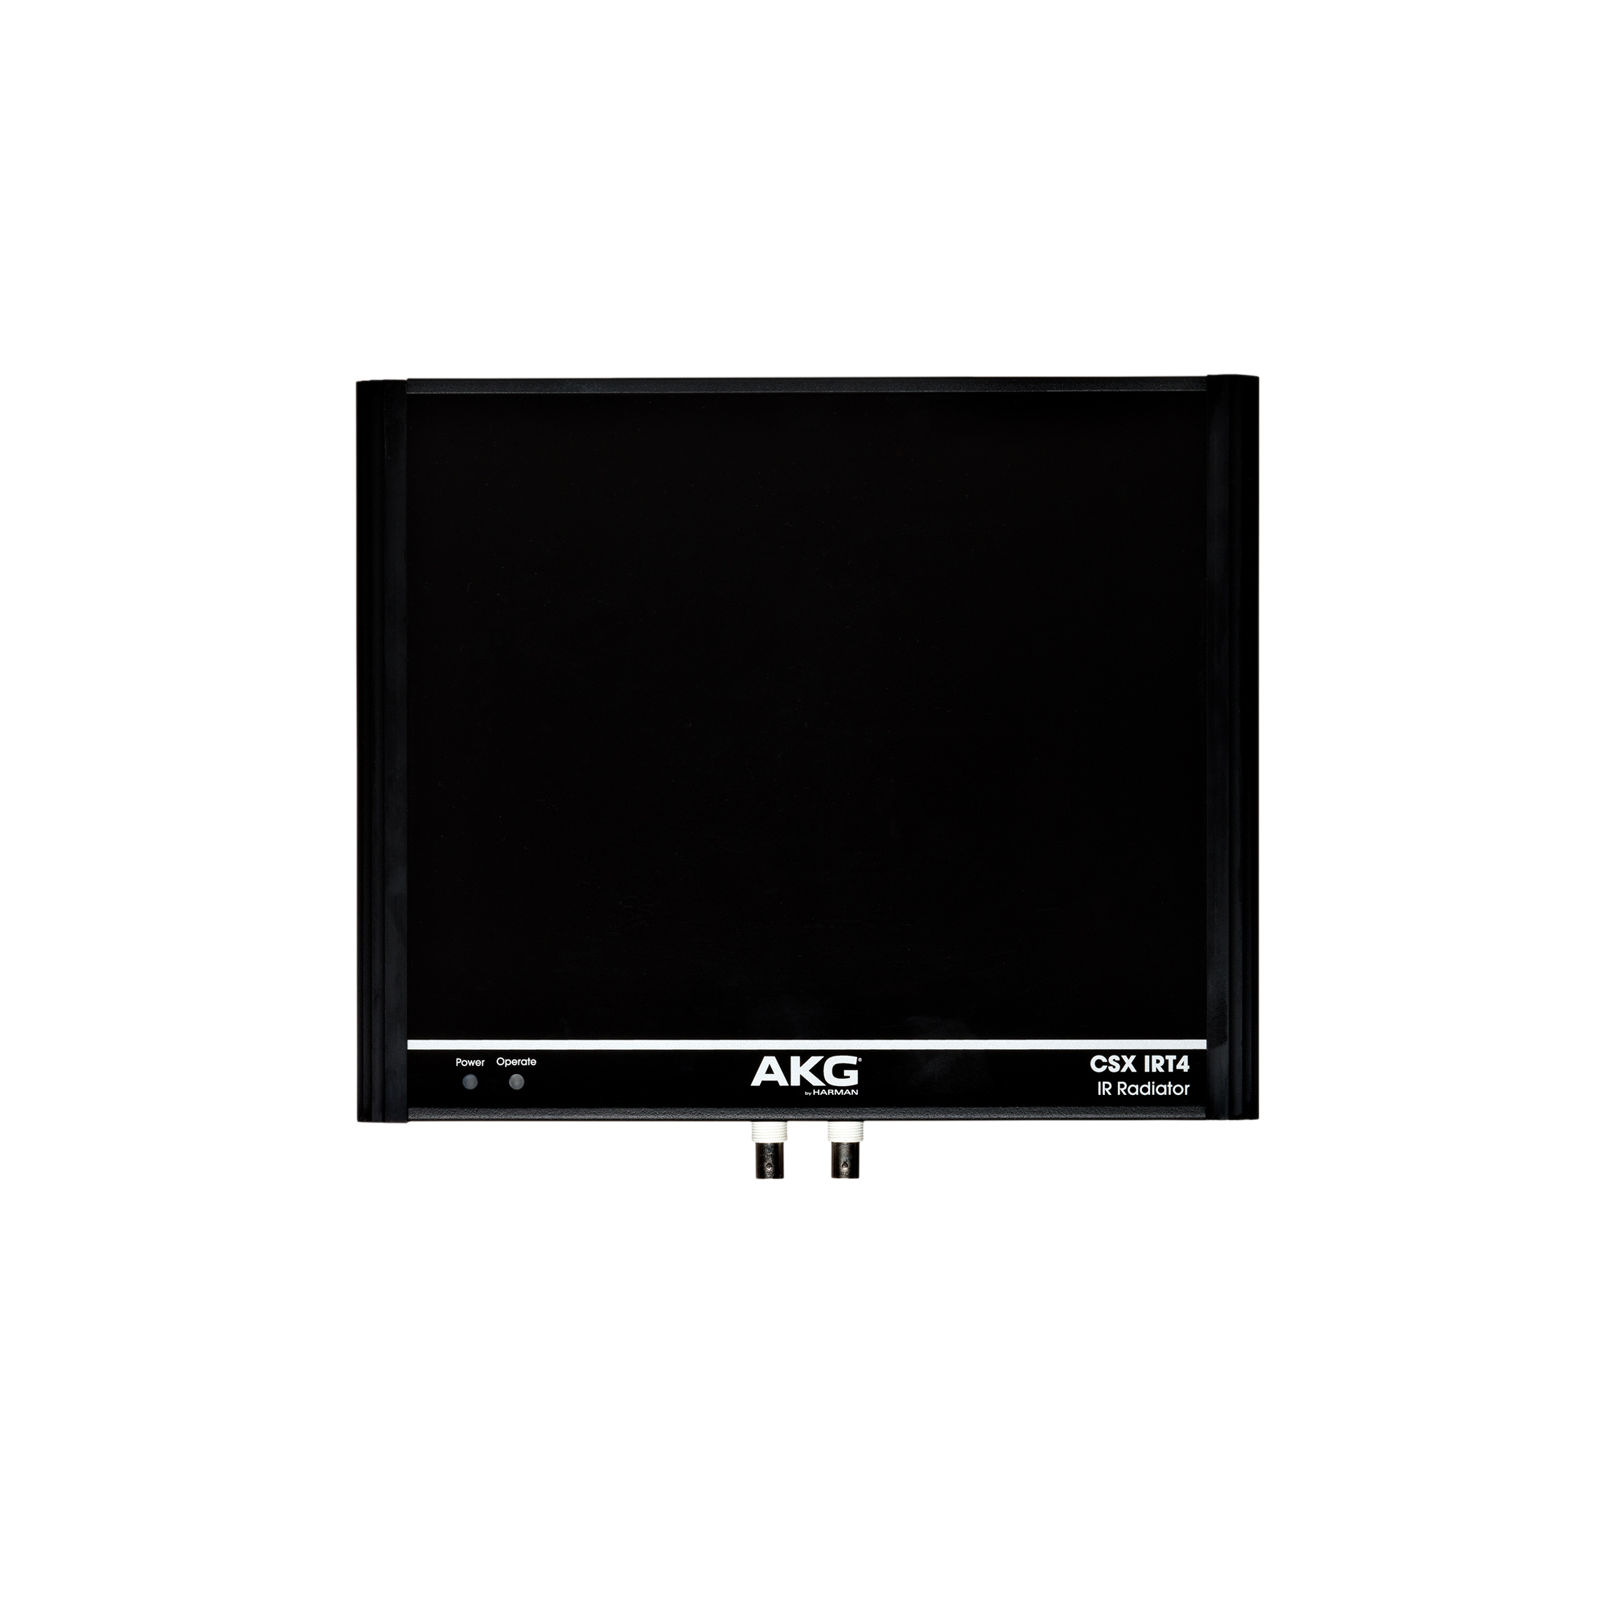 CSX IRT4 - Black - 10 channel infrared transmitter +/-60° - Front